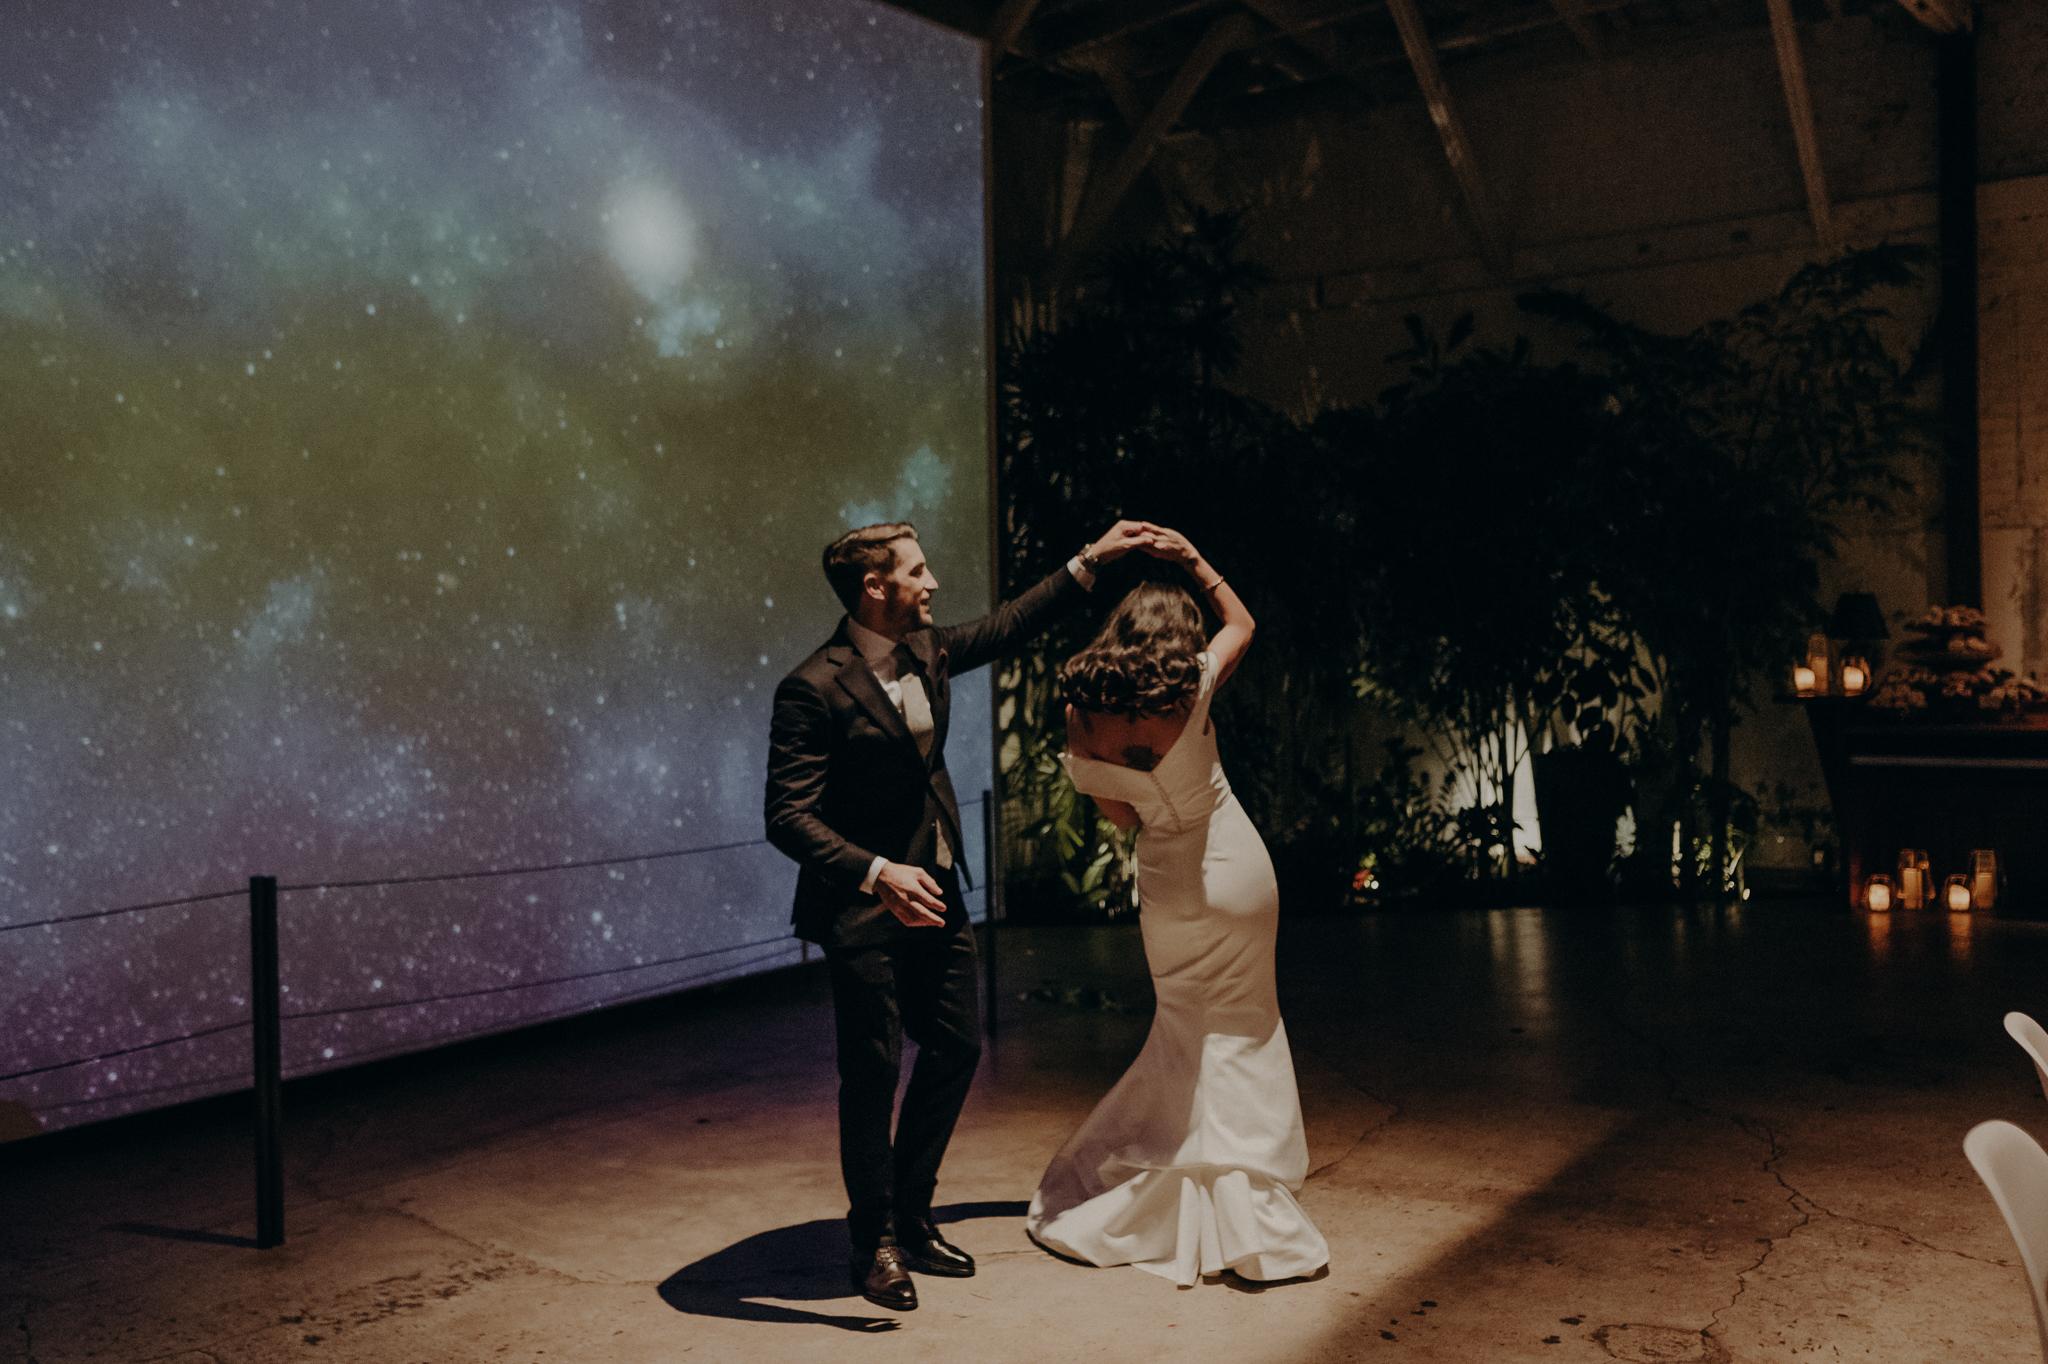 Wedding Photo LA - wedding photographer in los angeles - millwick wedding venue -isaiahandtaylor.com-120.jpg